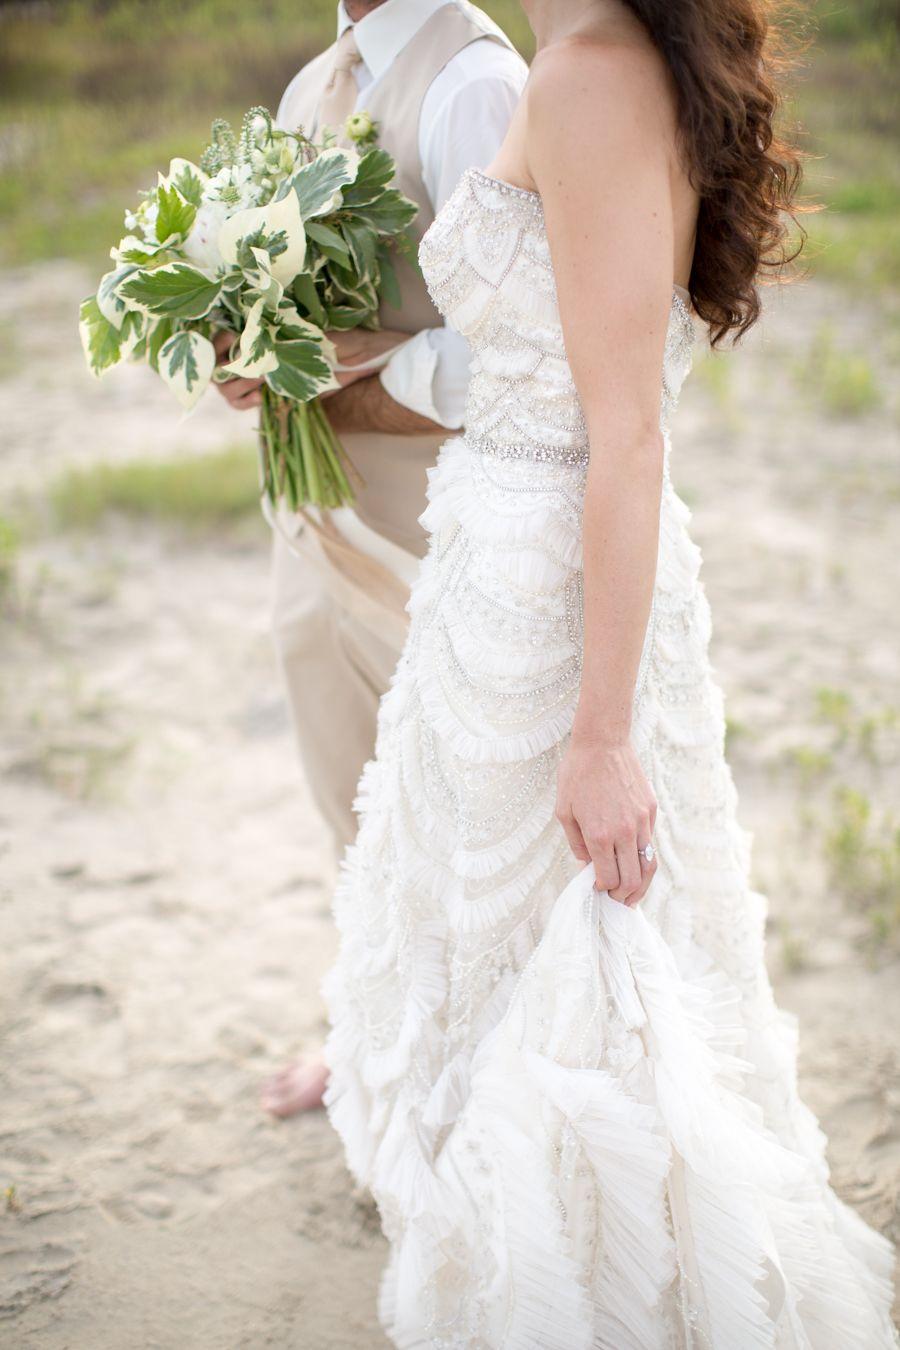 Gorgeous Shipwrecked Wedding Inspiration - MODwedding